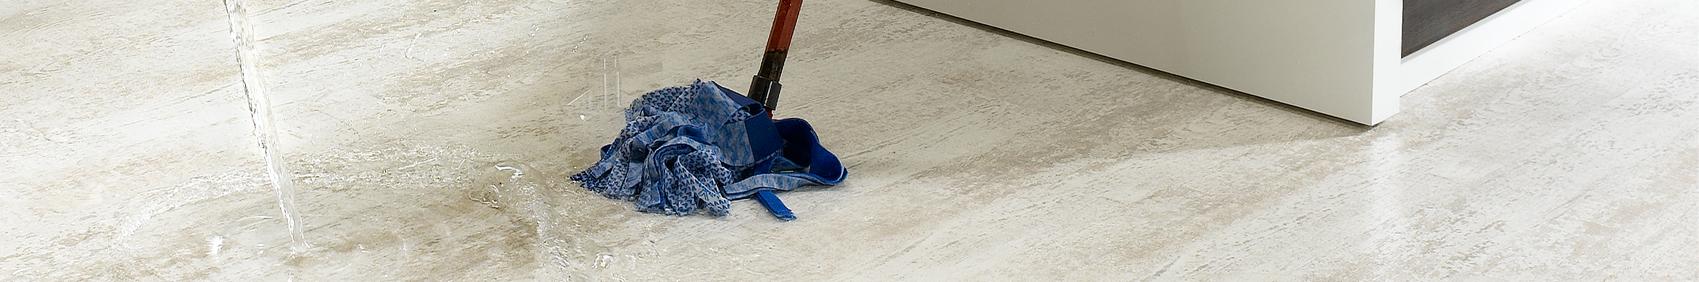 Pavimento vinilico 5 mm con posa flottante